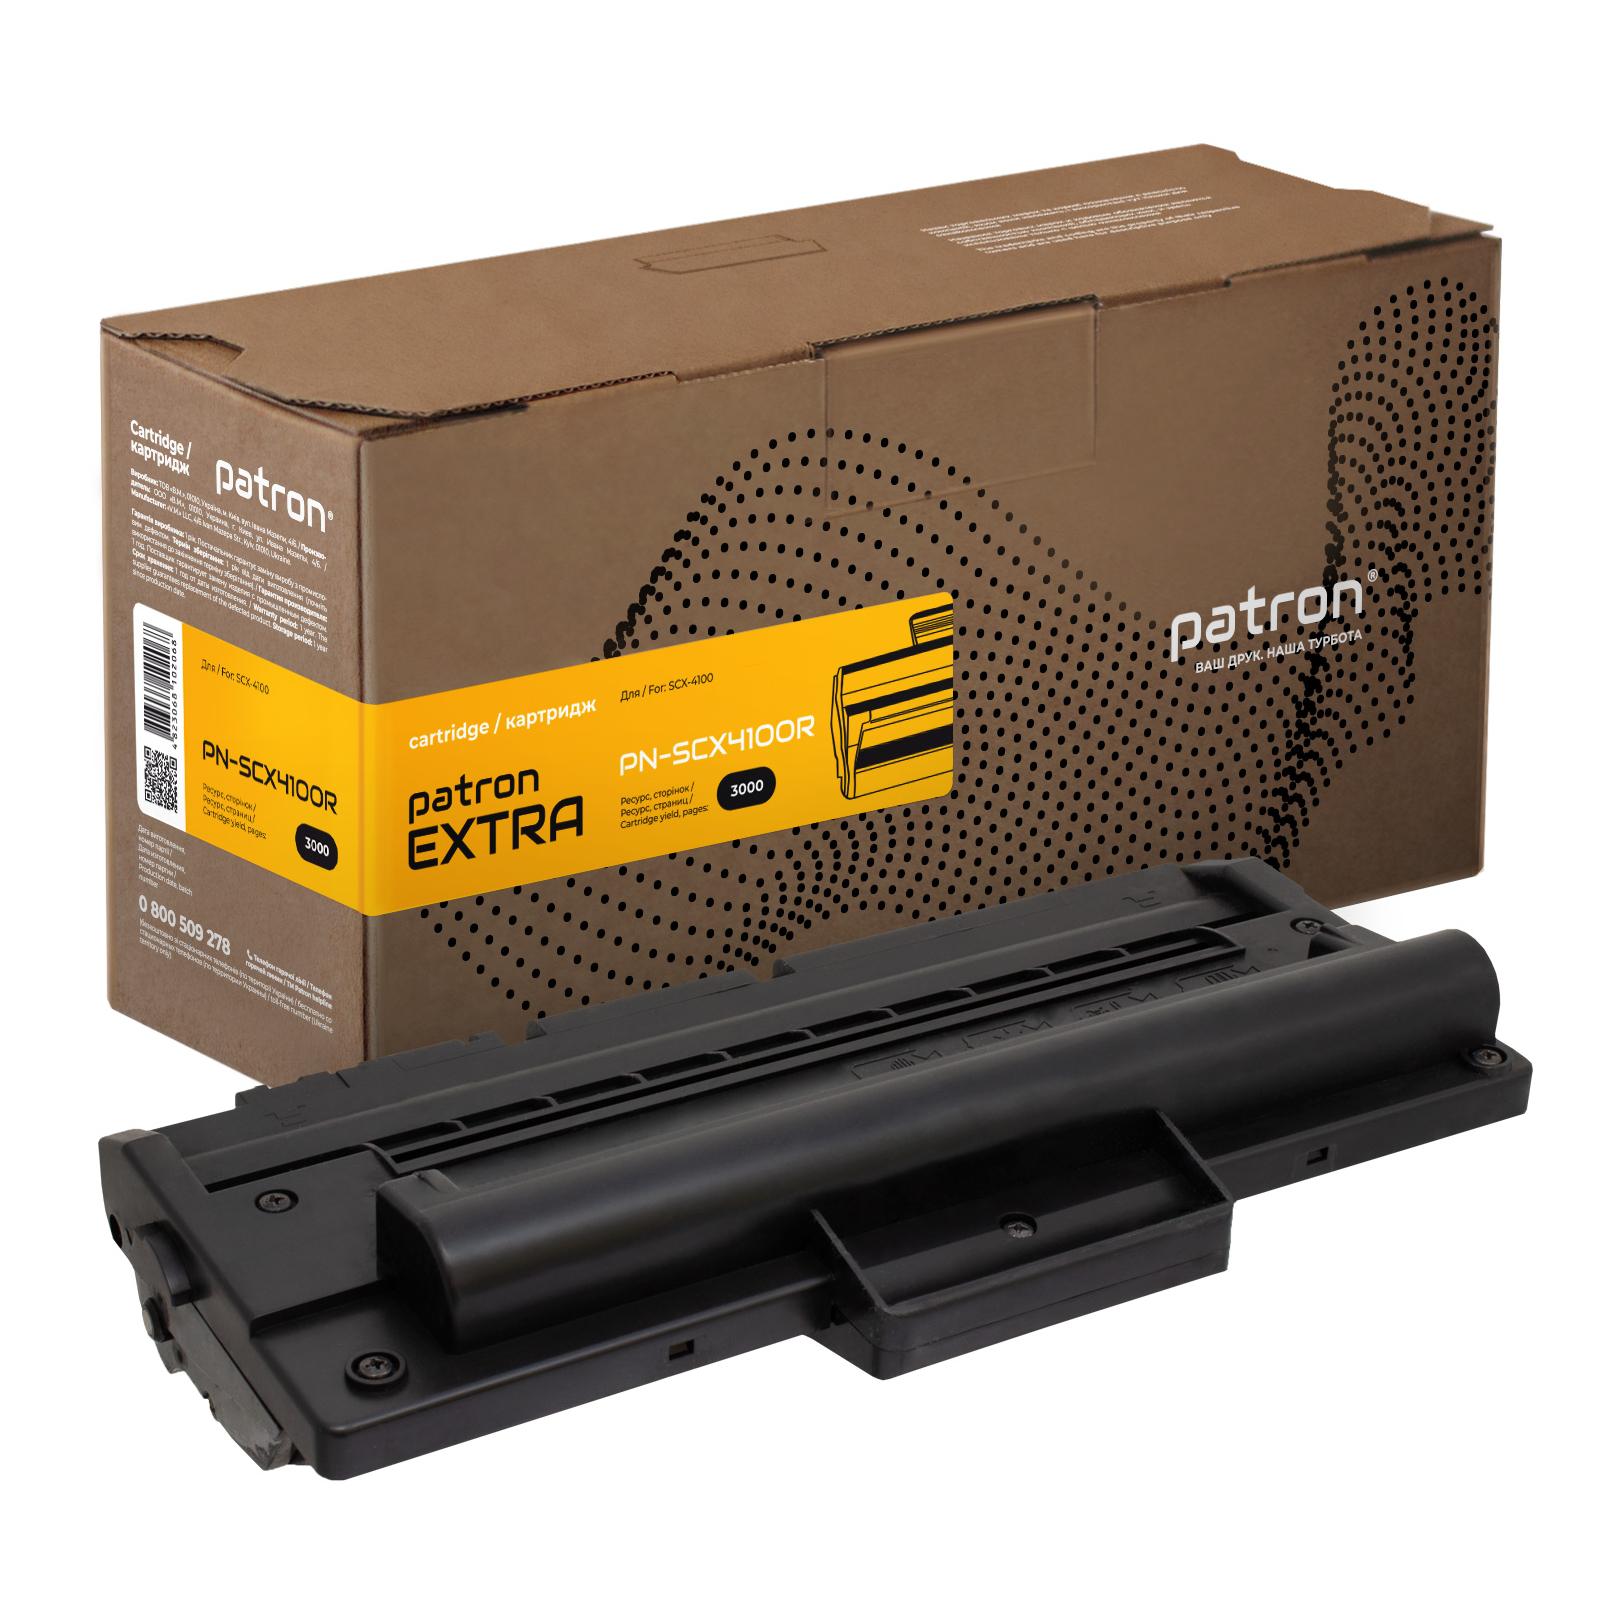 Картридж PATRON SAMSUNG SCX-4100 EXTRA (PN-SCX4100R)